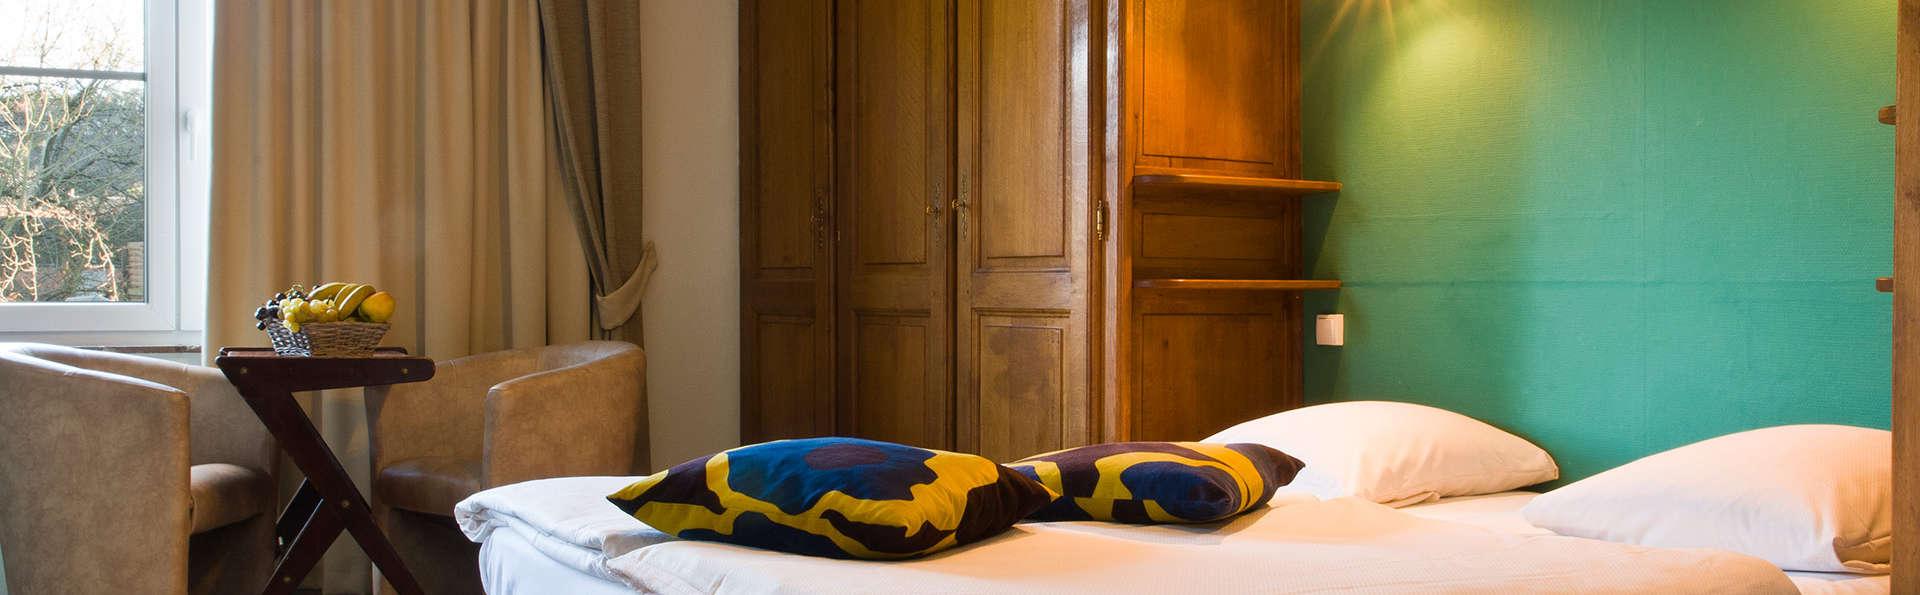 Cocoon Hotel Grenier des Grottes - EDIT_room11.jpg